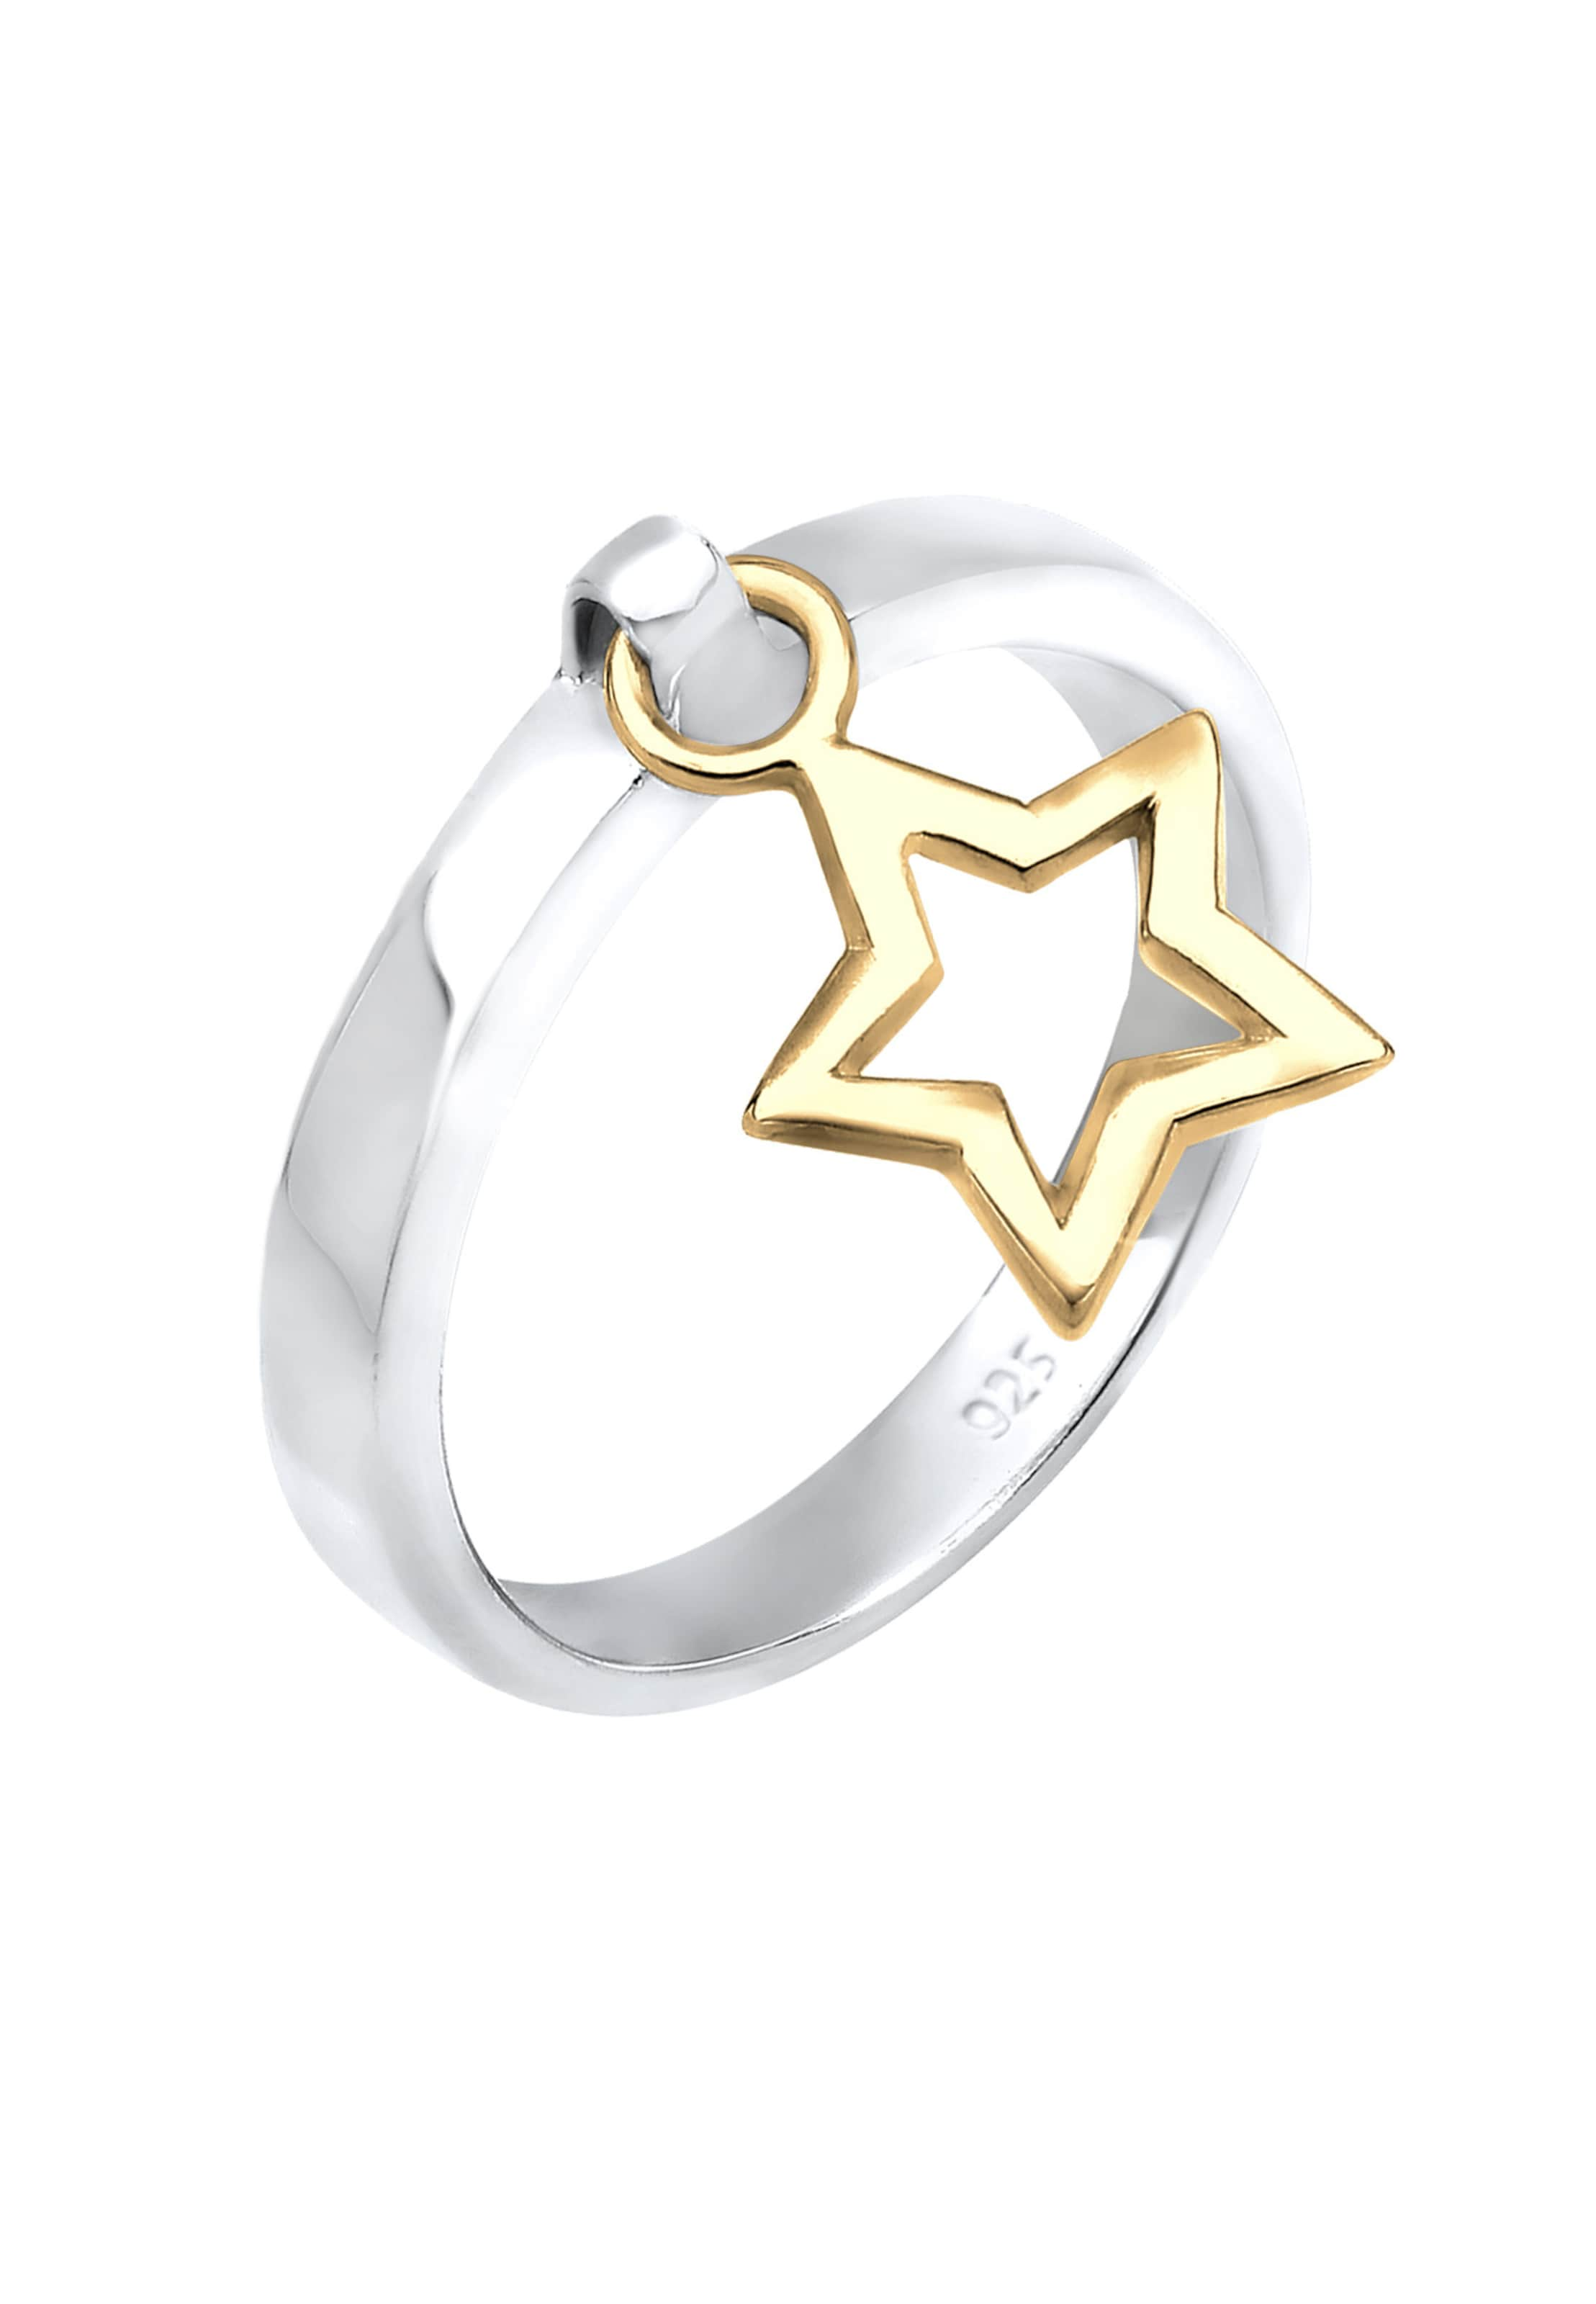 'sterne' Ring 'sterne' Ring In Elli GoldSilber Elli jSVULMpGqz